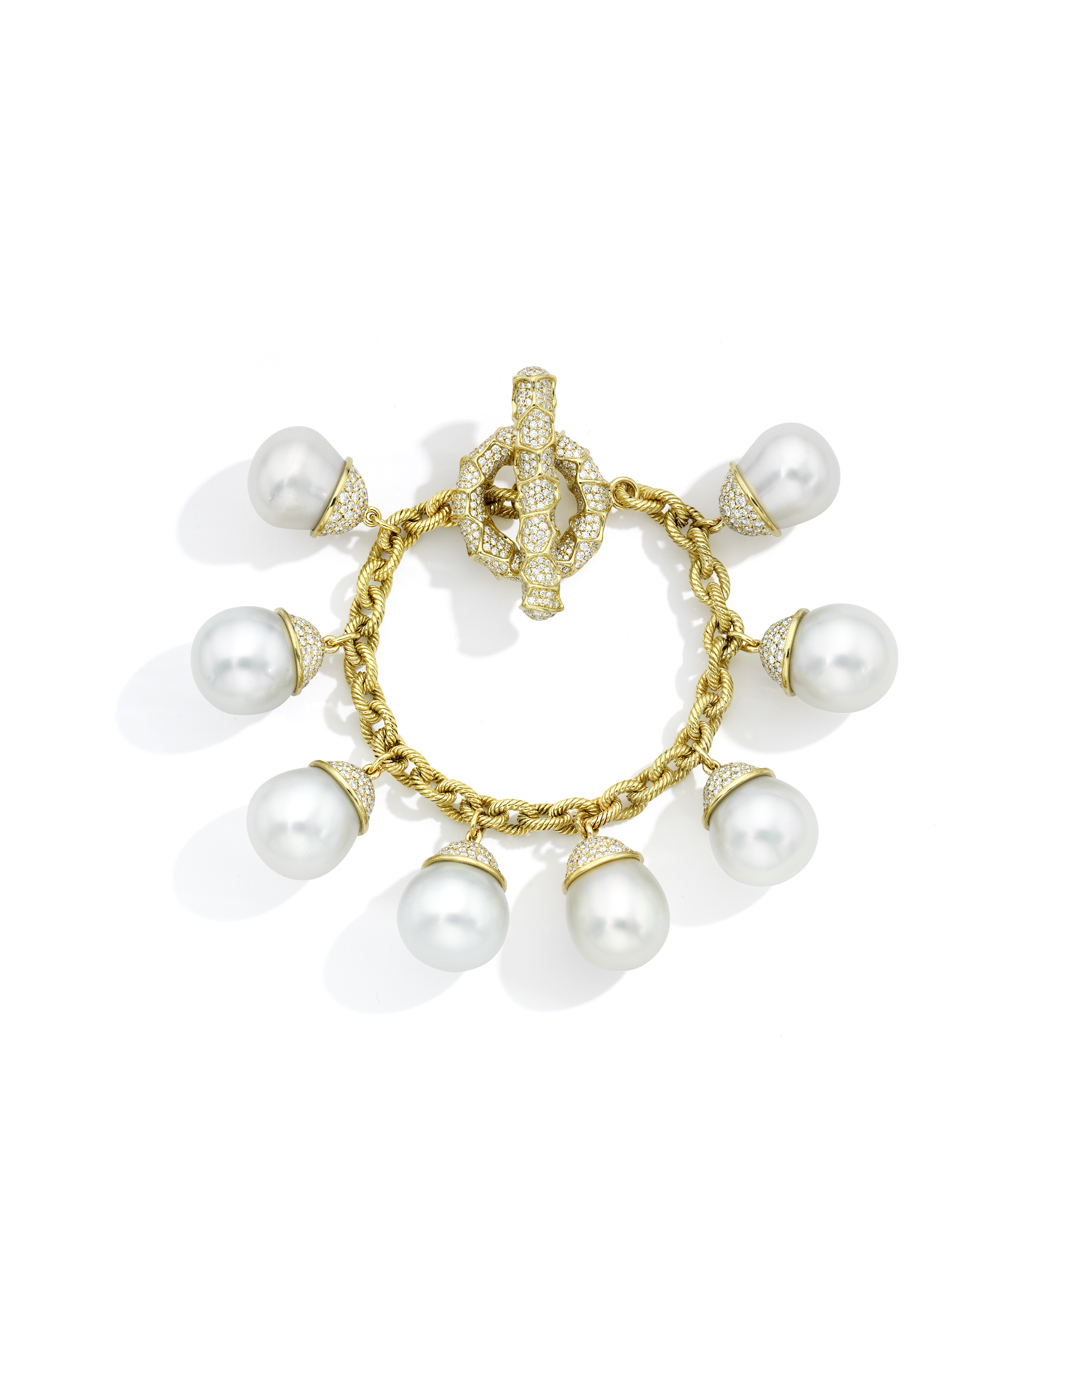 mish_jewelry_product_Honeywood-Pearl-Charm-Bracelet-1